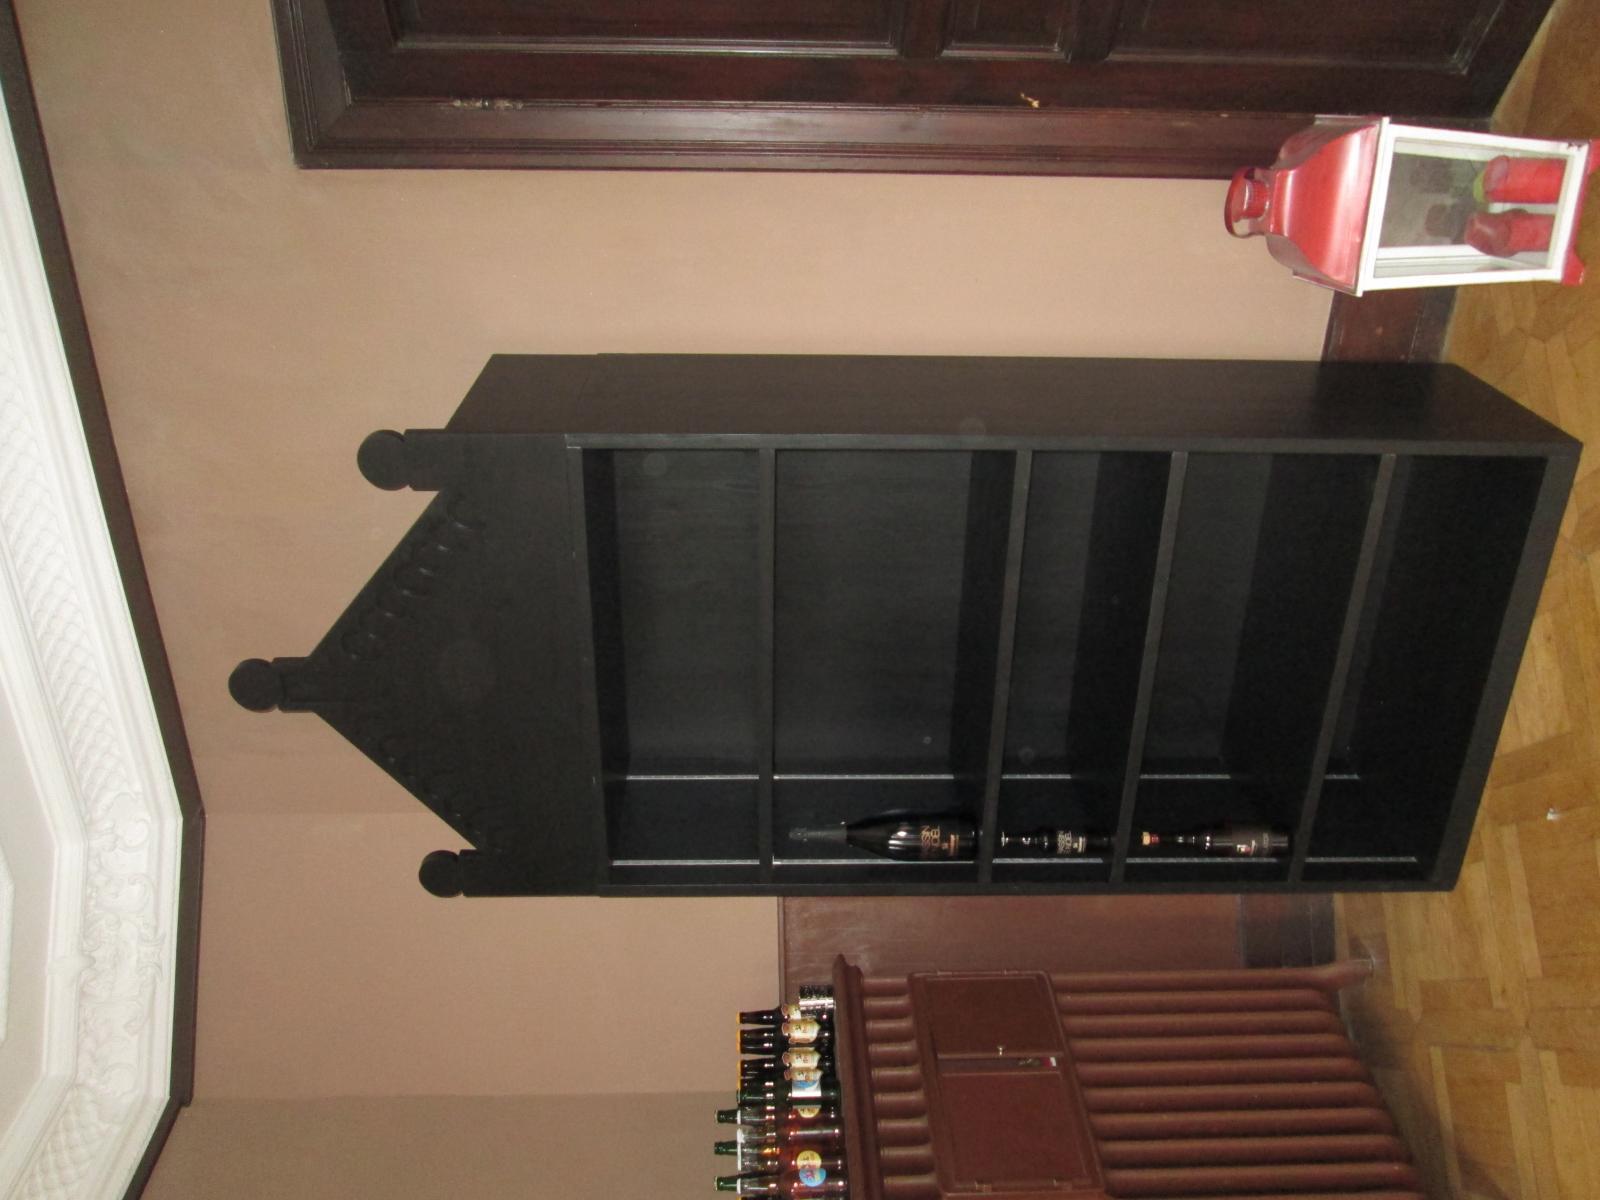 meuble de prsentation medium size of meuble console traduction anglais coiffeuse ancien style. Black Bedroom Furniture Sets. Home Design Ideas